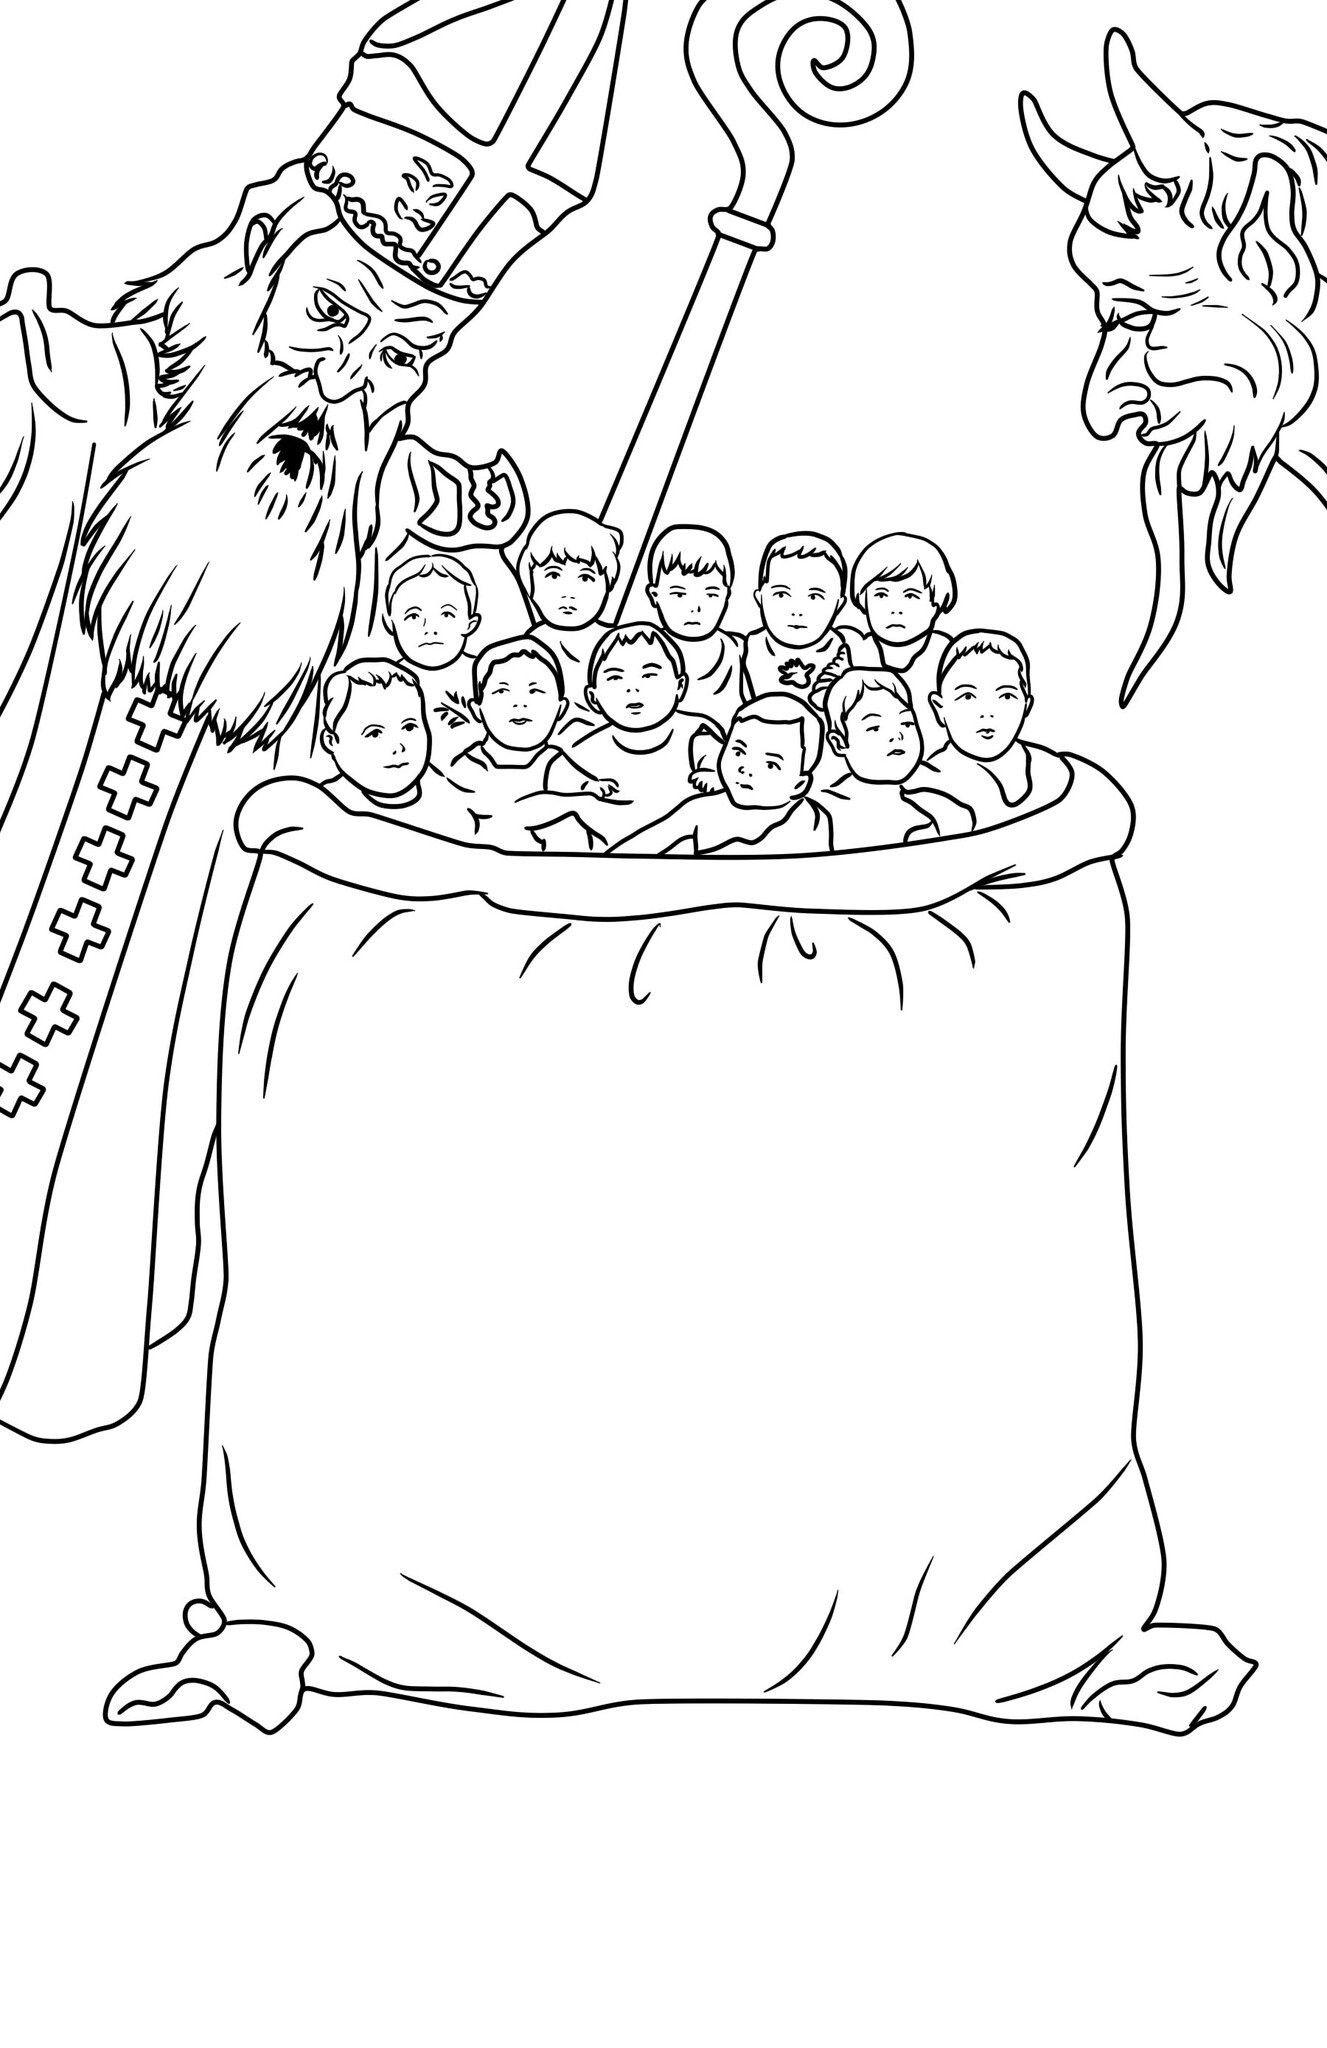 Ausmalbilder Nikolaus Mit Krampus : Krampus Christmas Fairytale Coloring Pages Pinterest